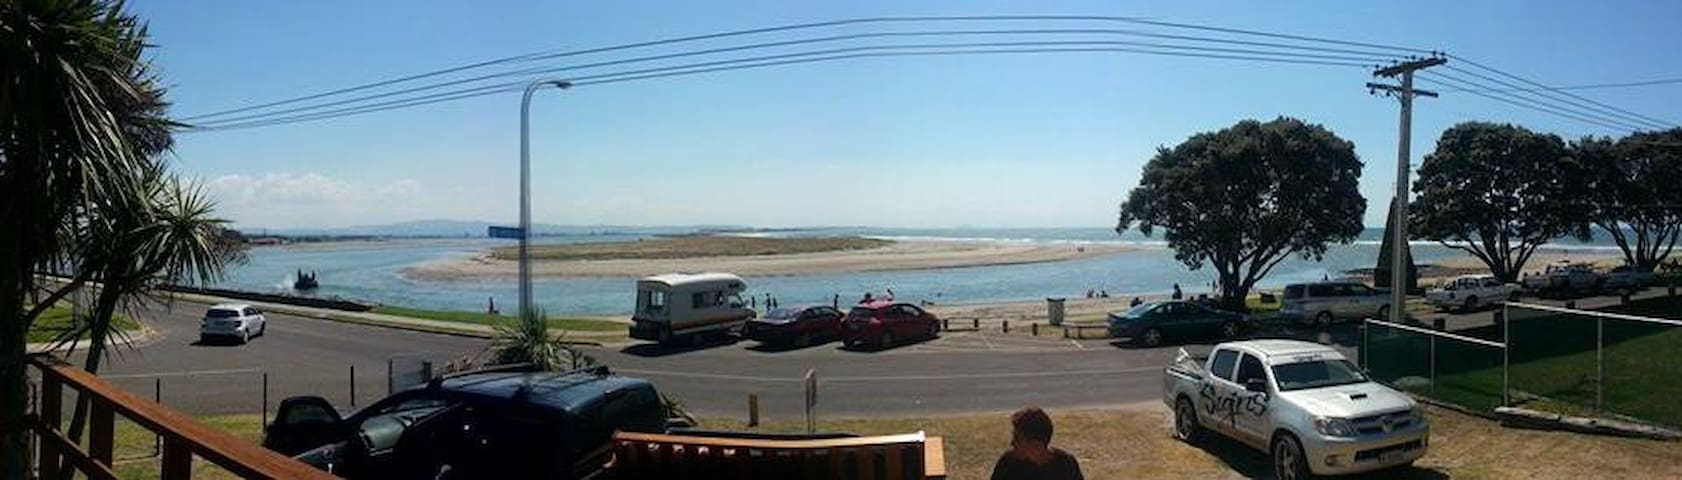 Beach front kiwi bach - Maketu - Hus